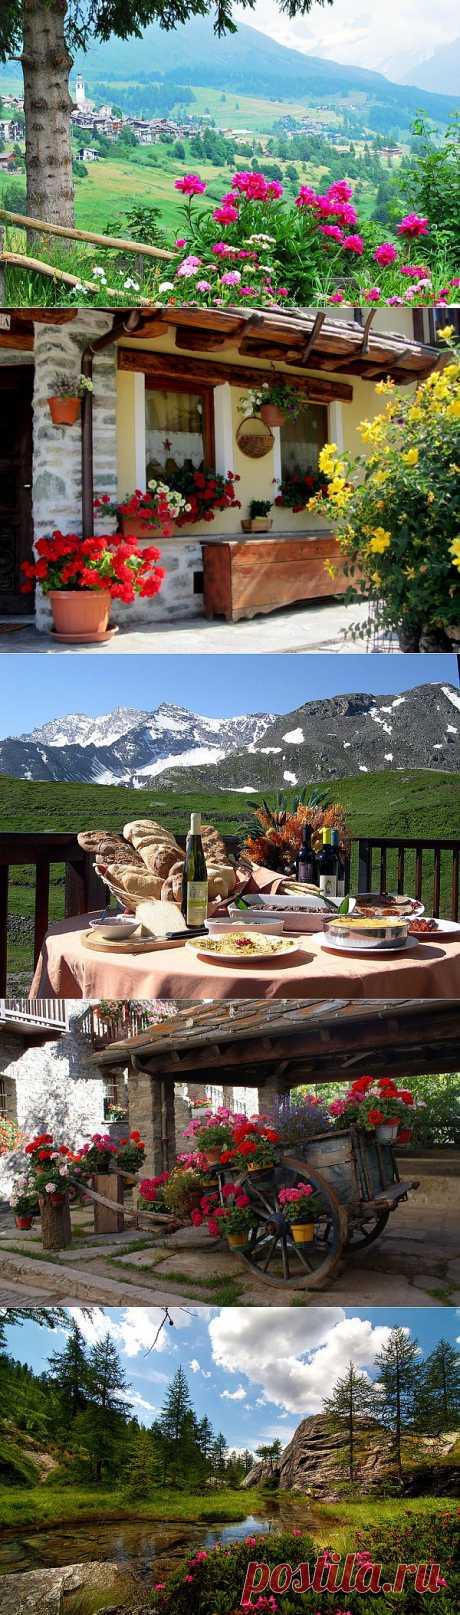 Живописная долина Валле-д'Аоста. Италия.